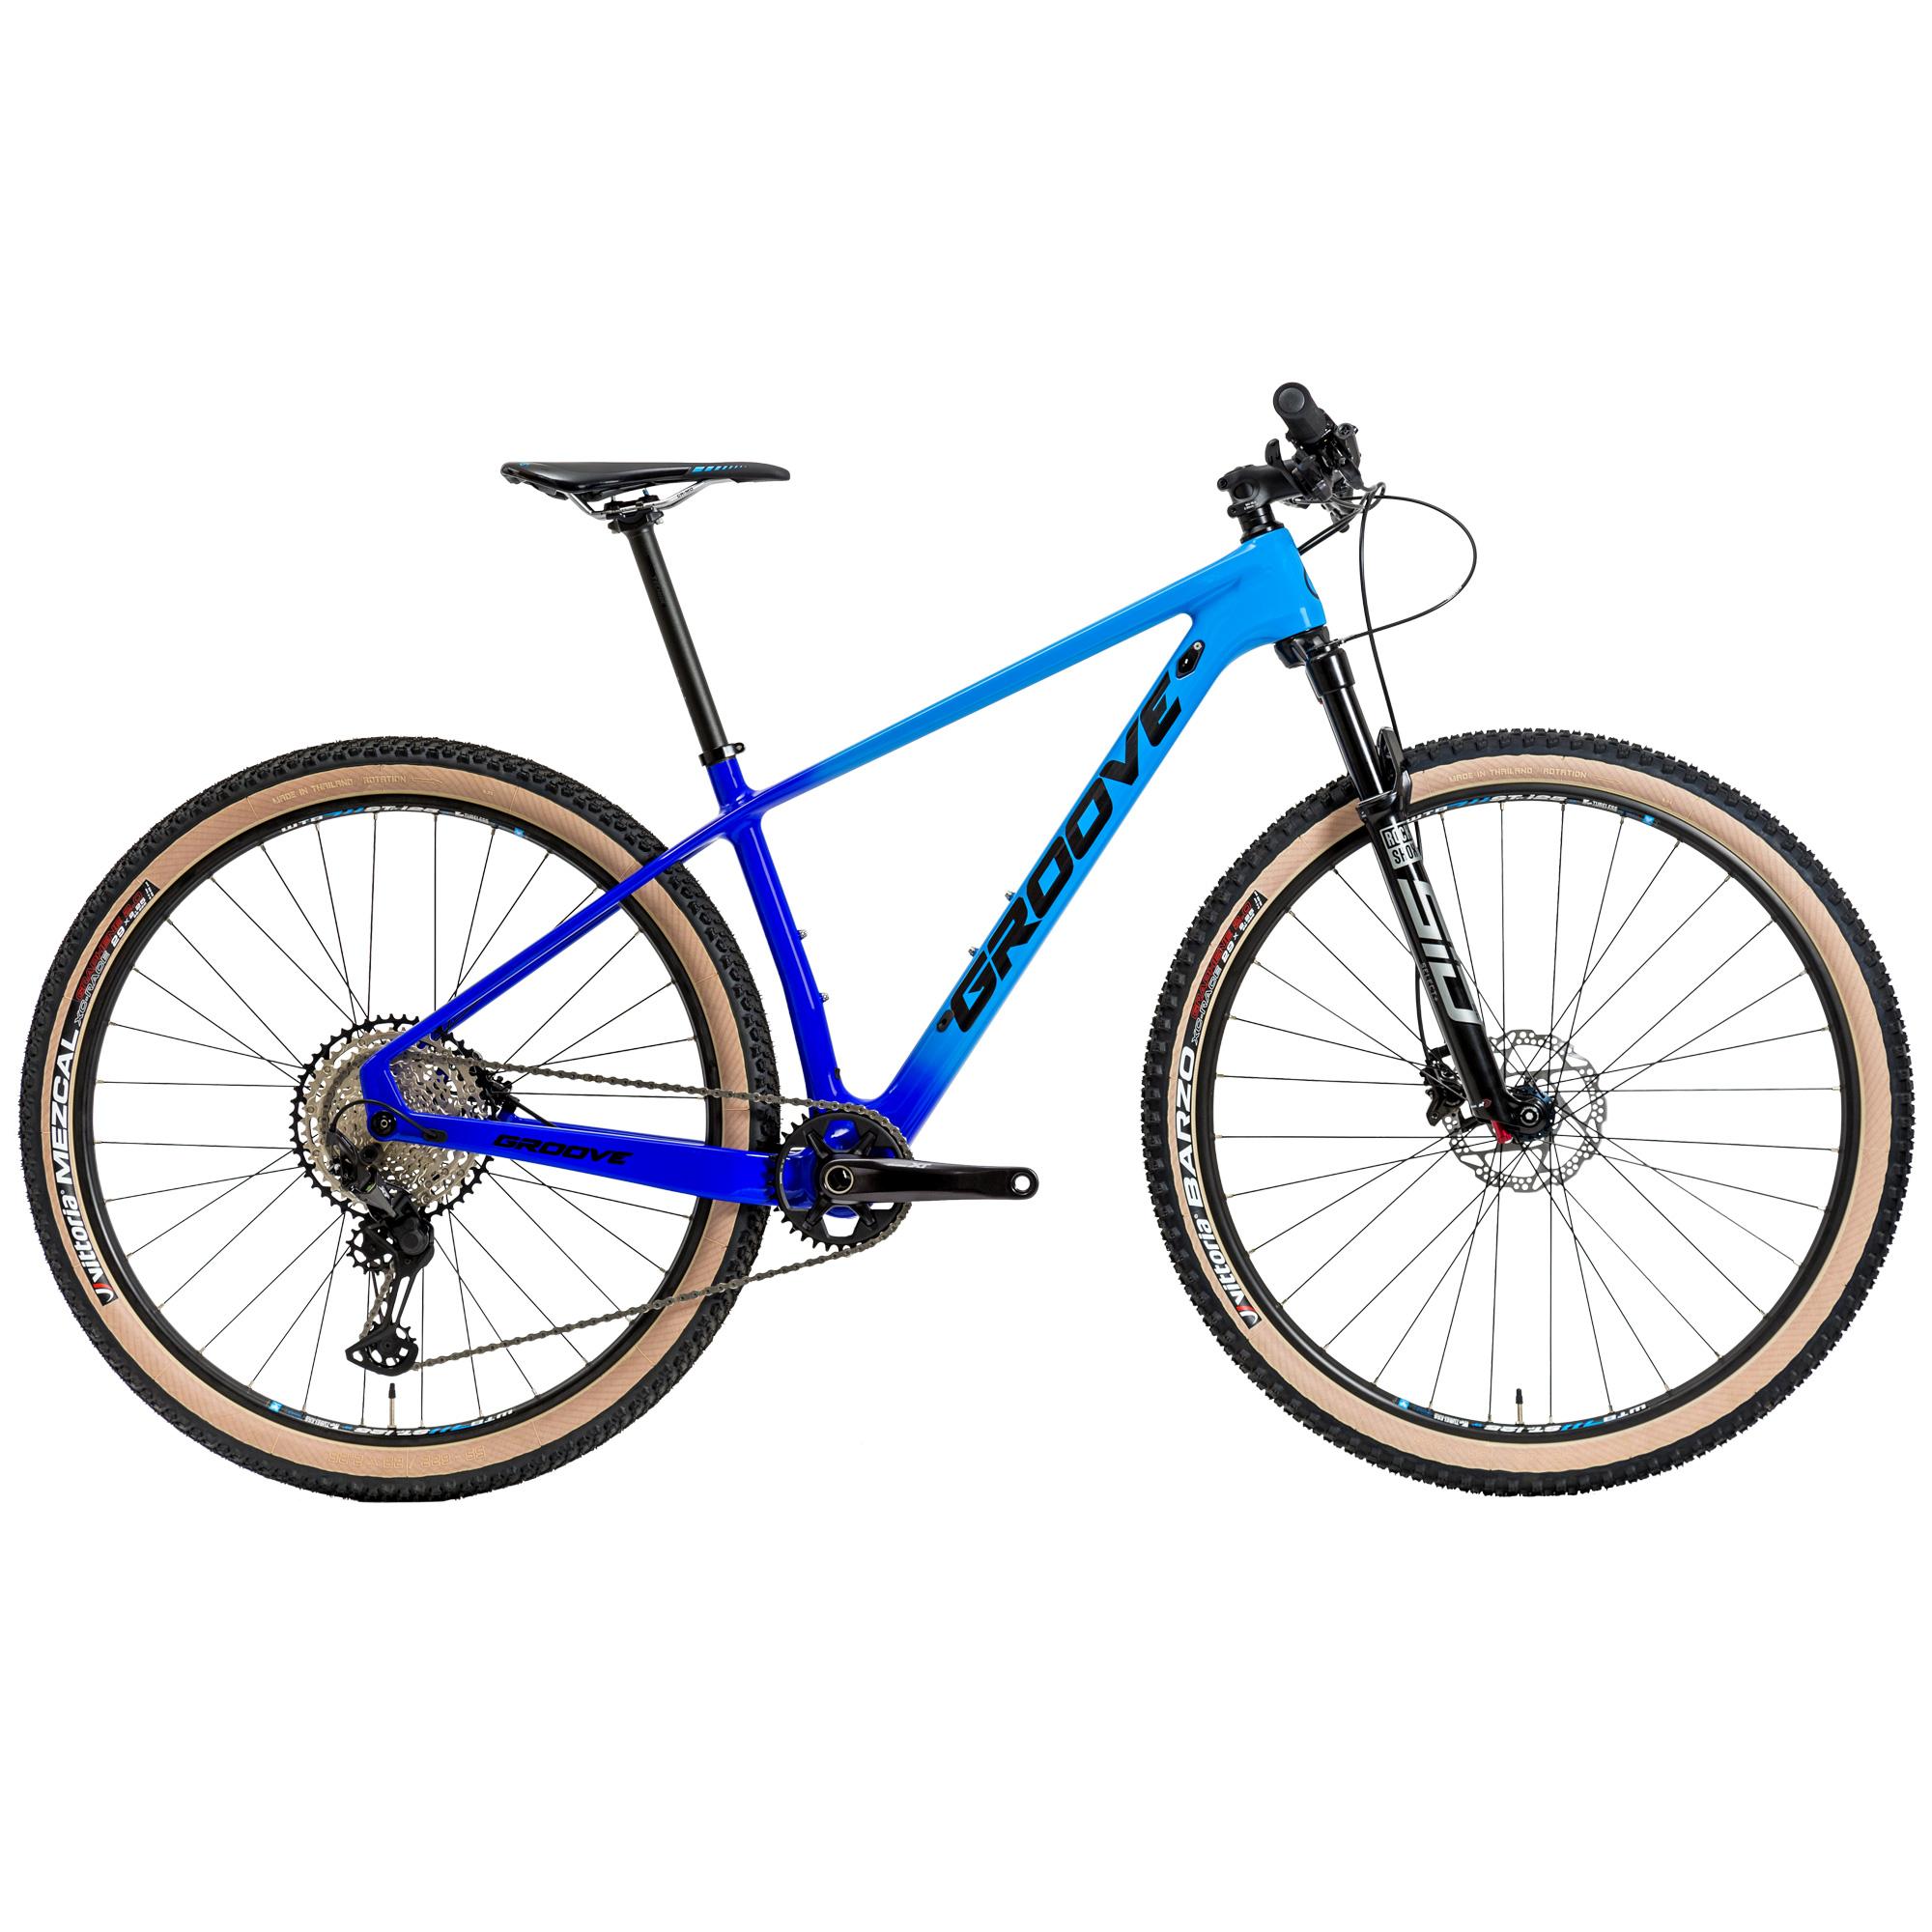 Bicicleta-Groove-Rhythm-9-01